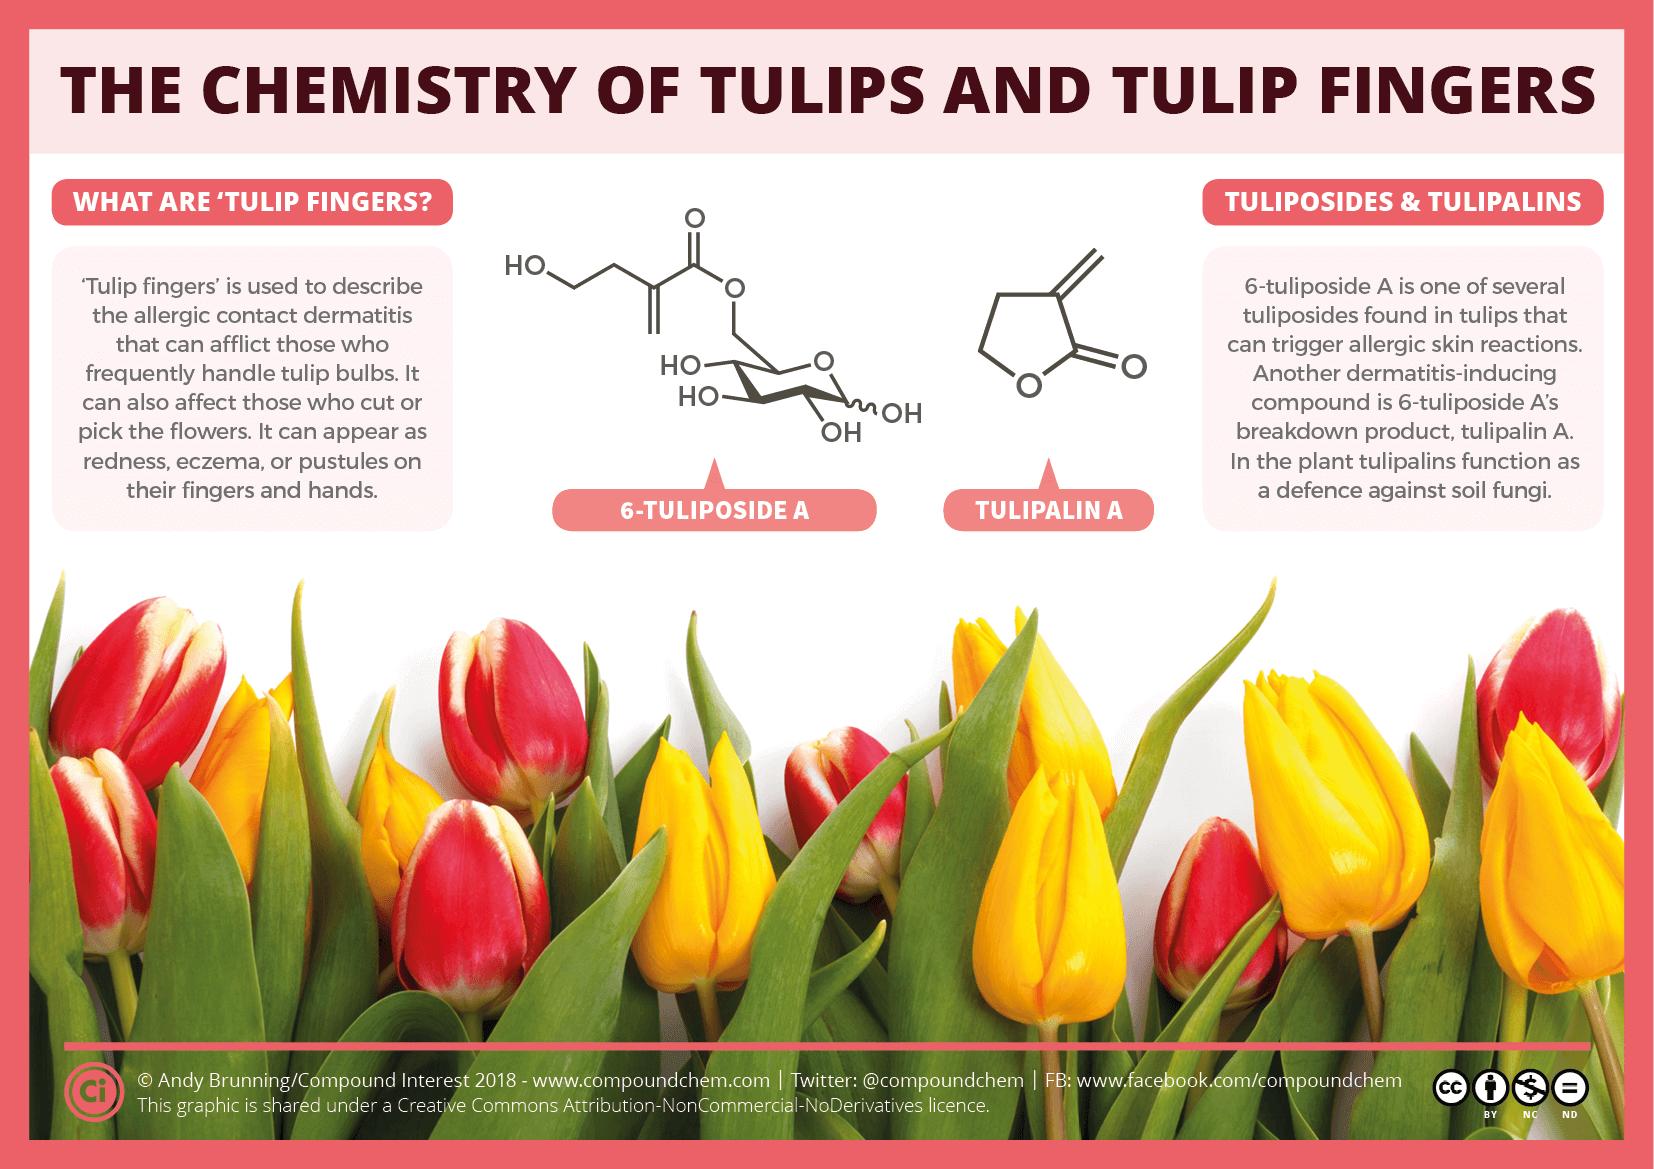 The chemistry of tulips and tulip fingers compound interest chemistry of tulips and tulip fingers izmirmasajfo